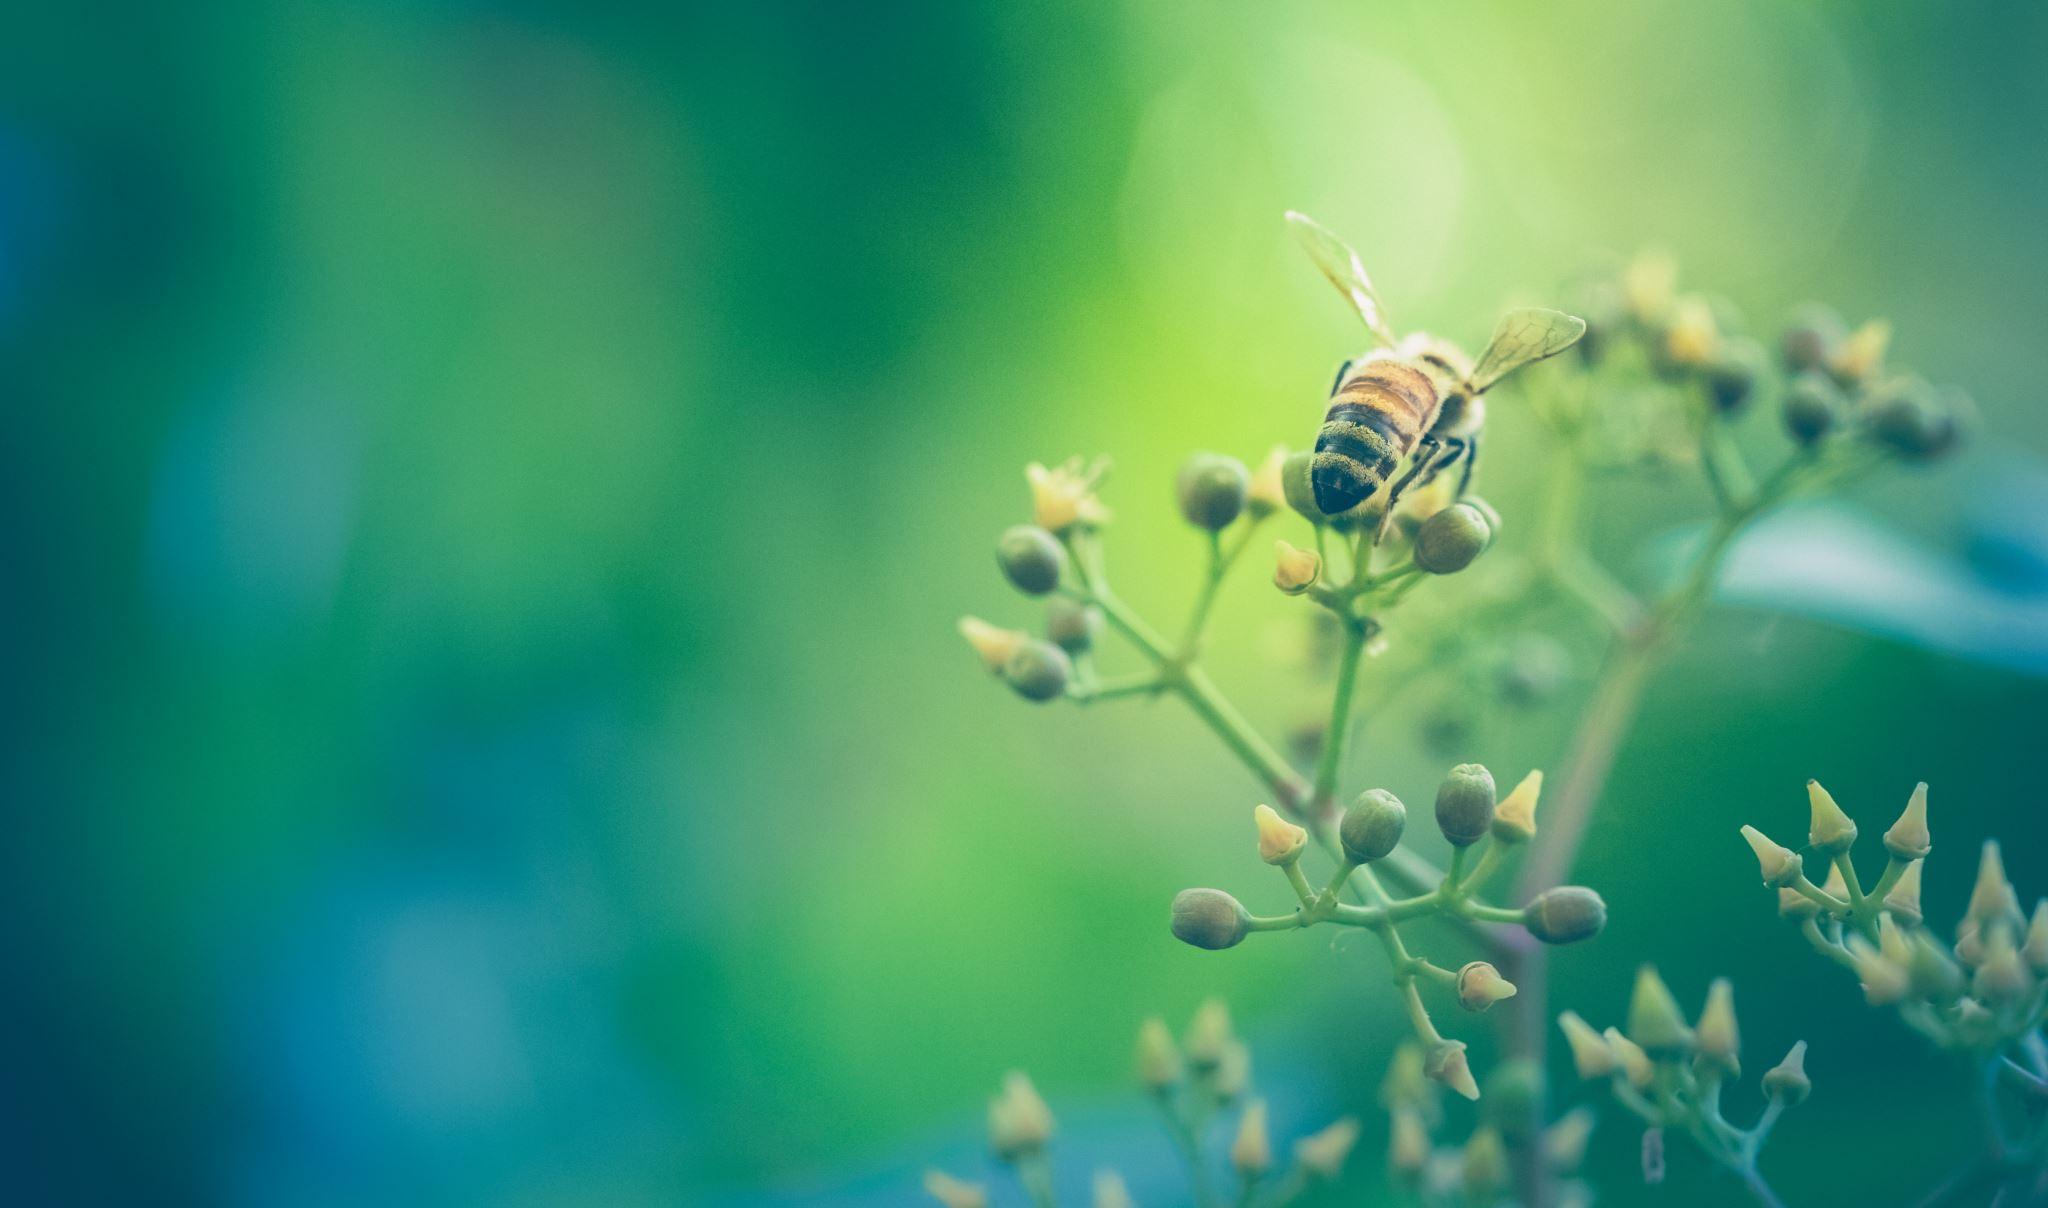 Honeybee gathering nectar